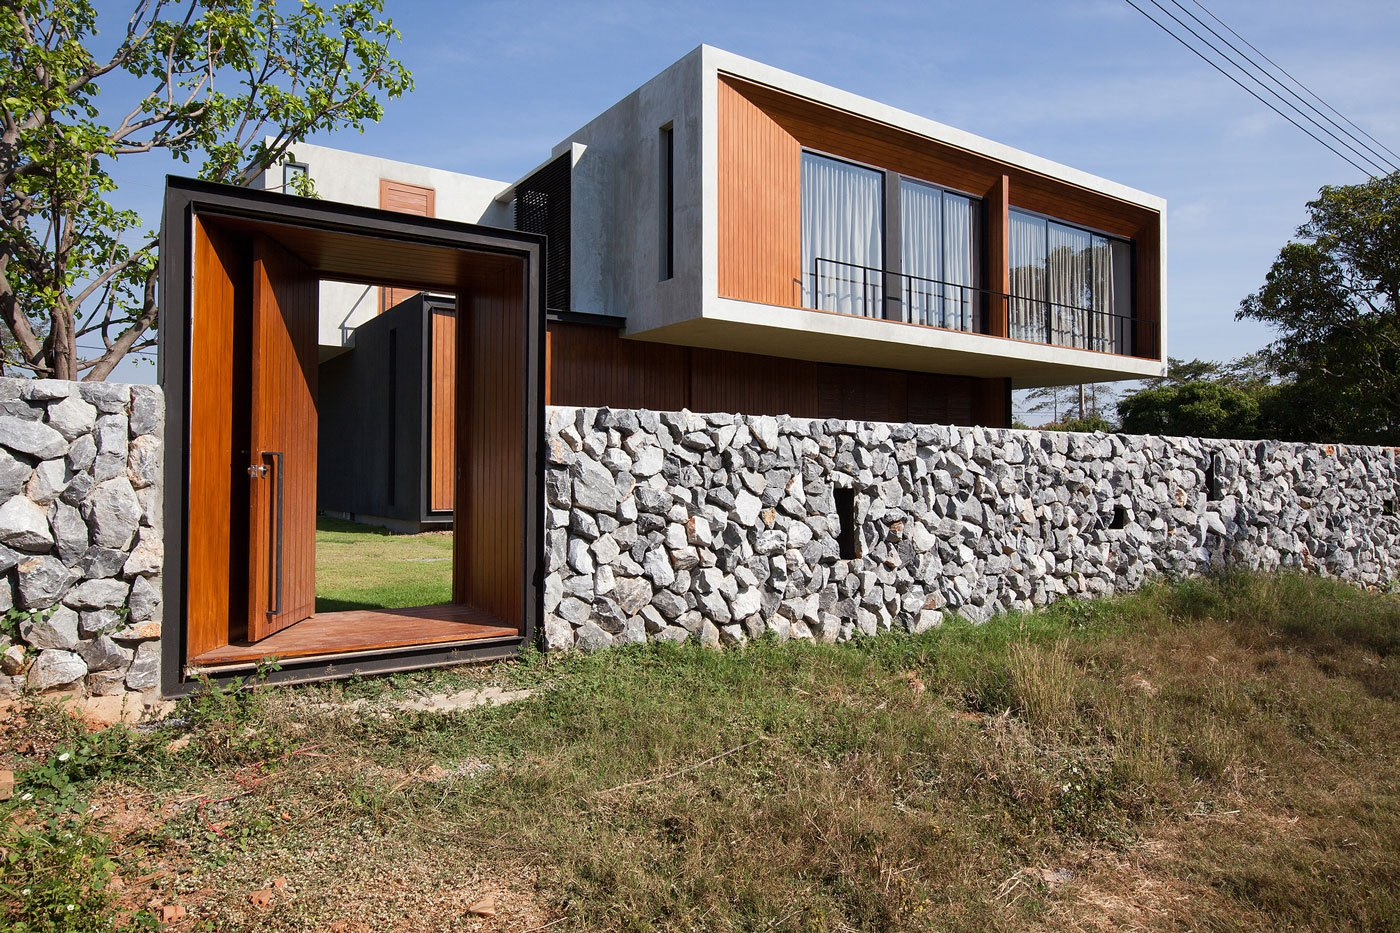 Забор из камня вокруг дома